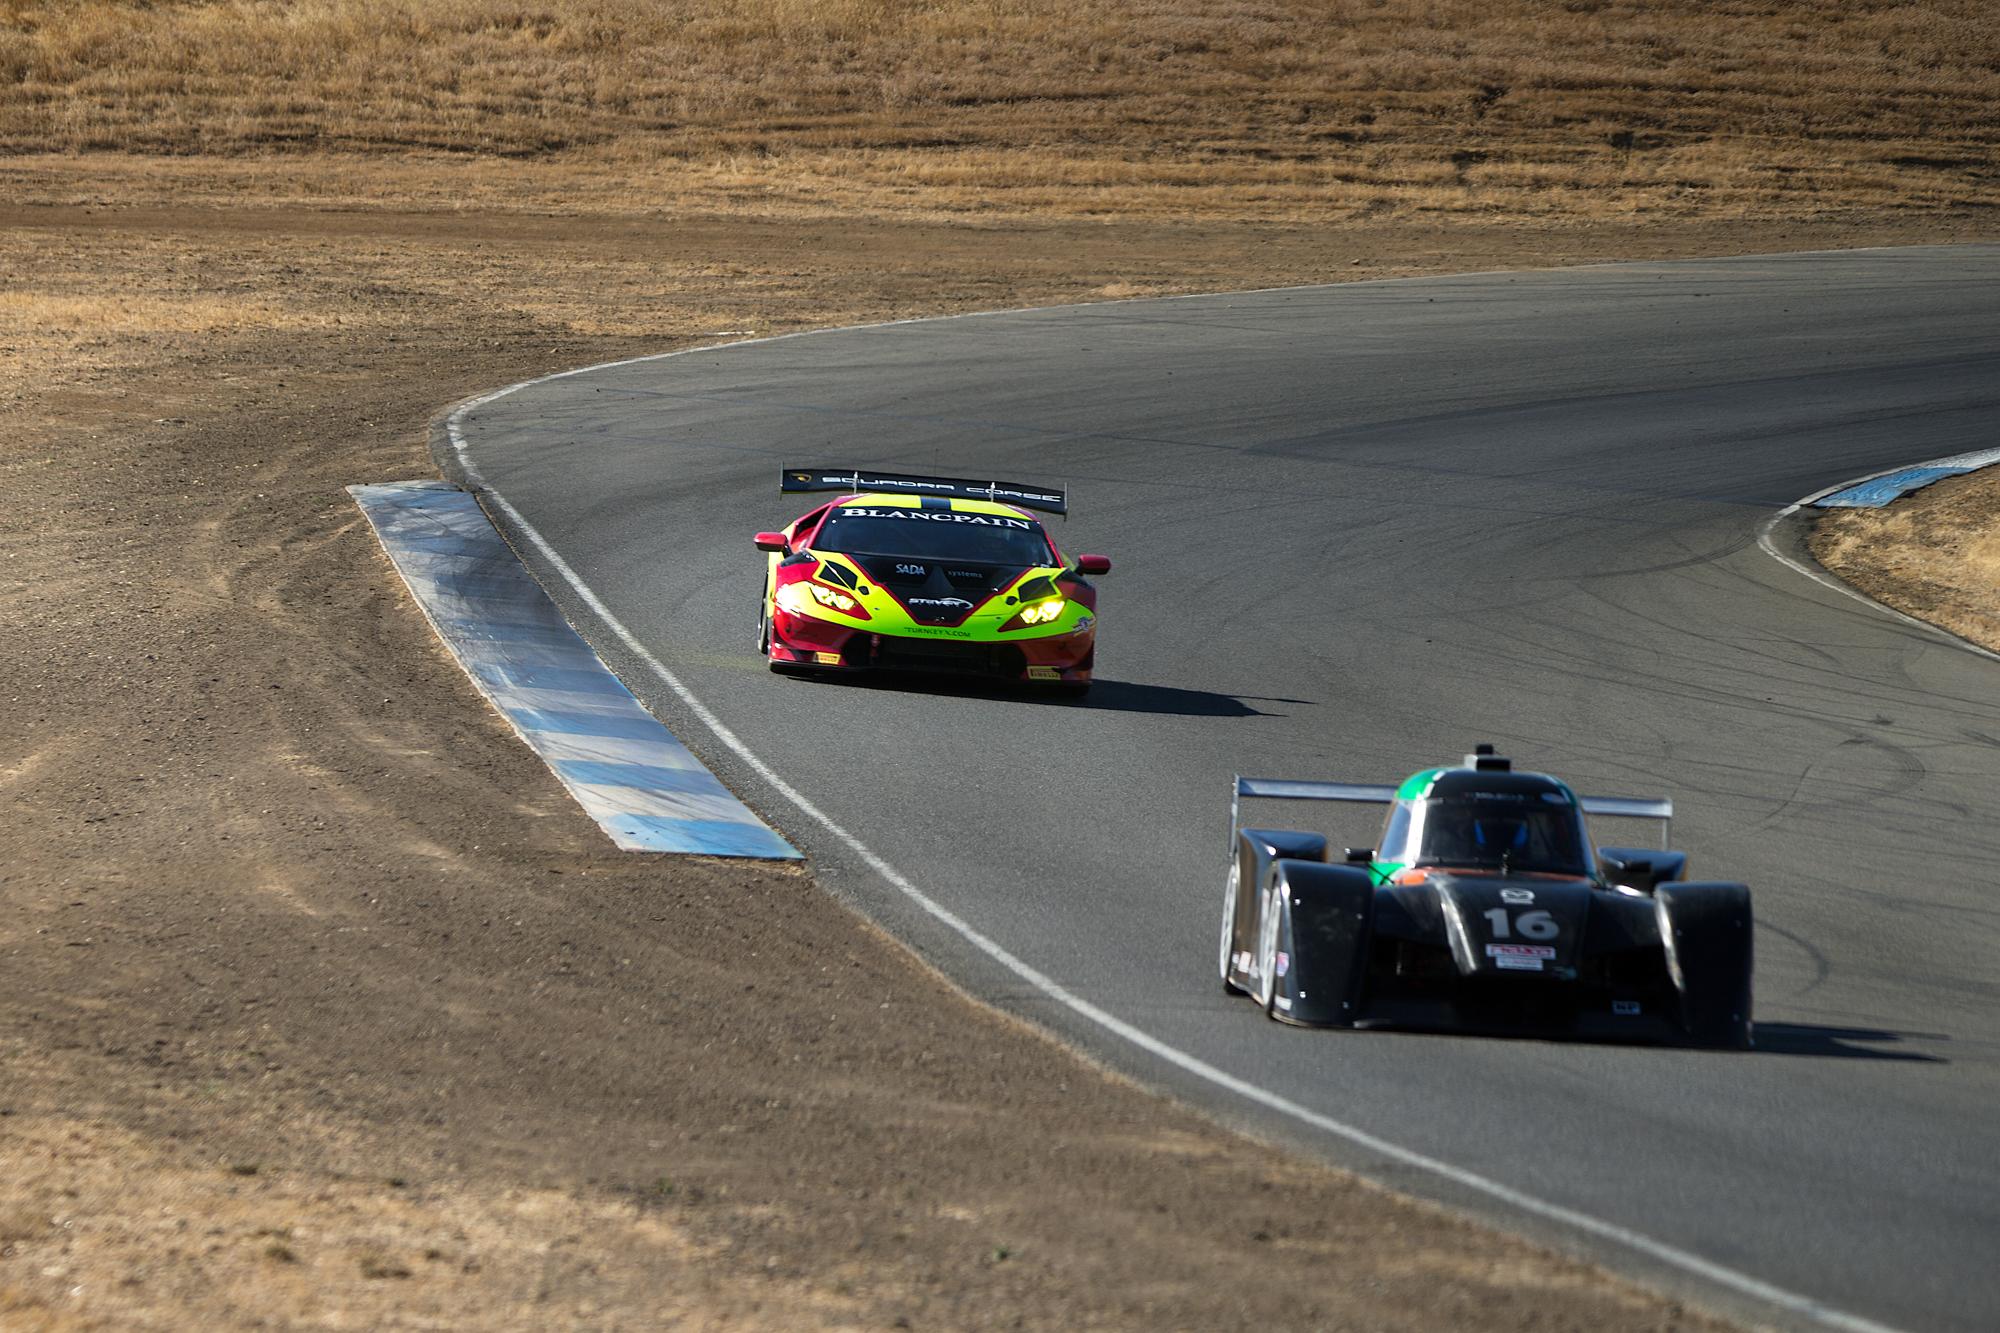 Steven-Racing-20171006-45206.jpg